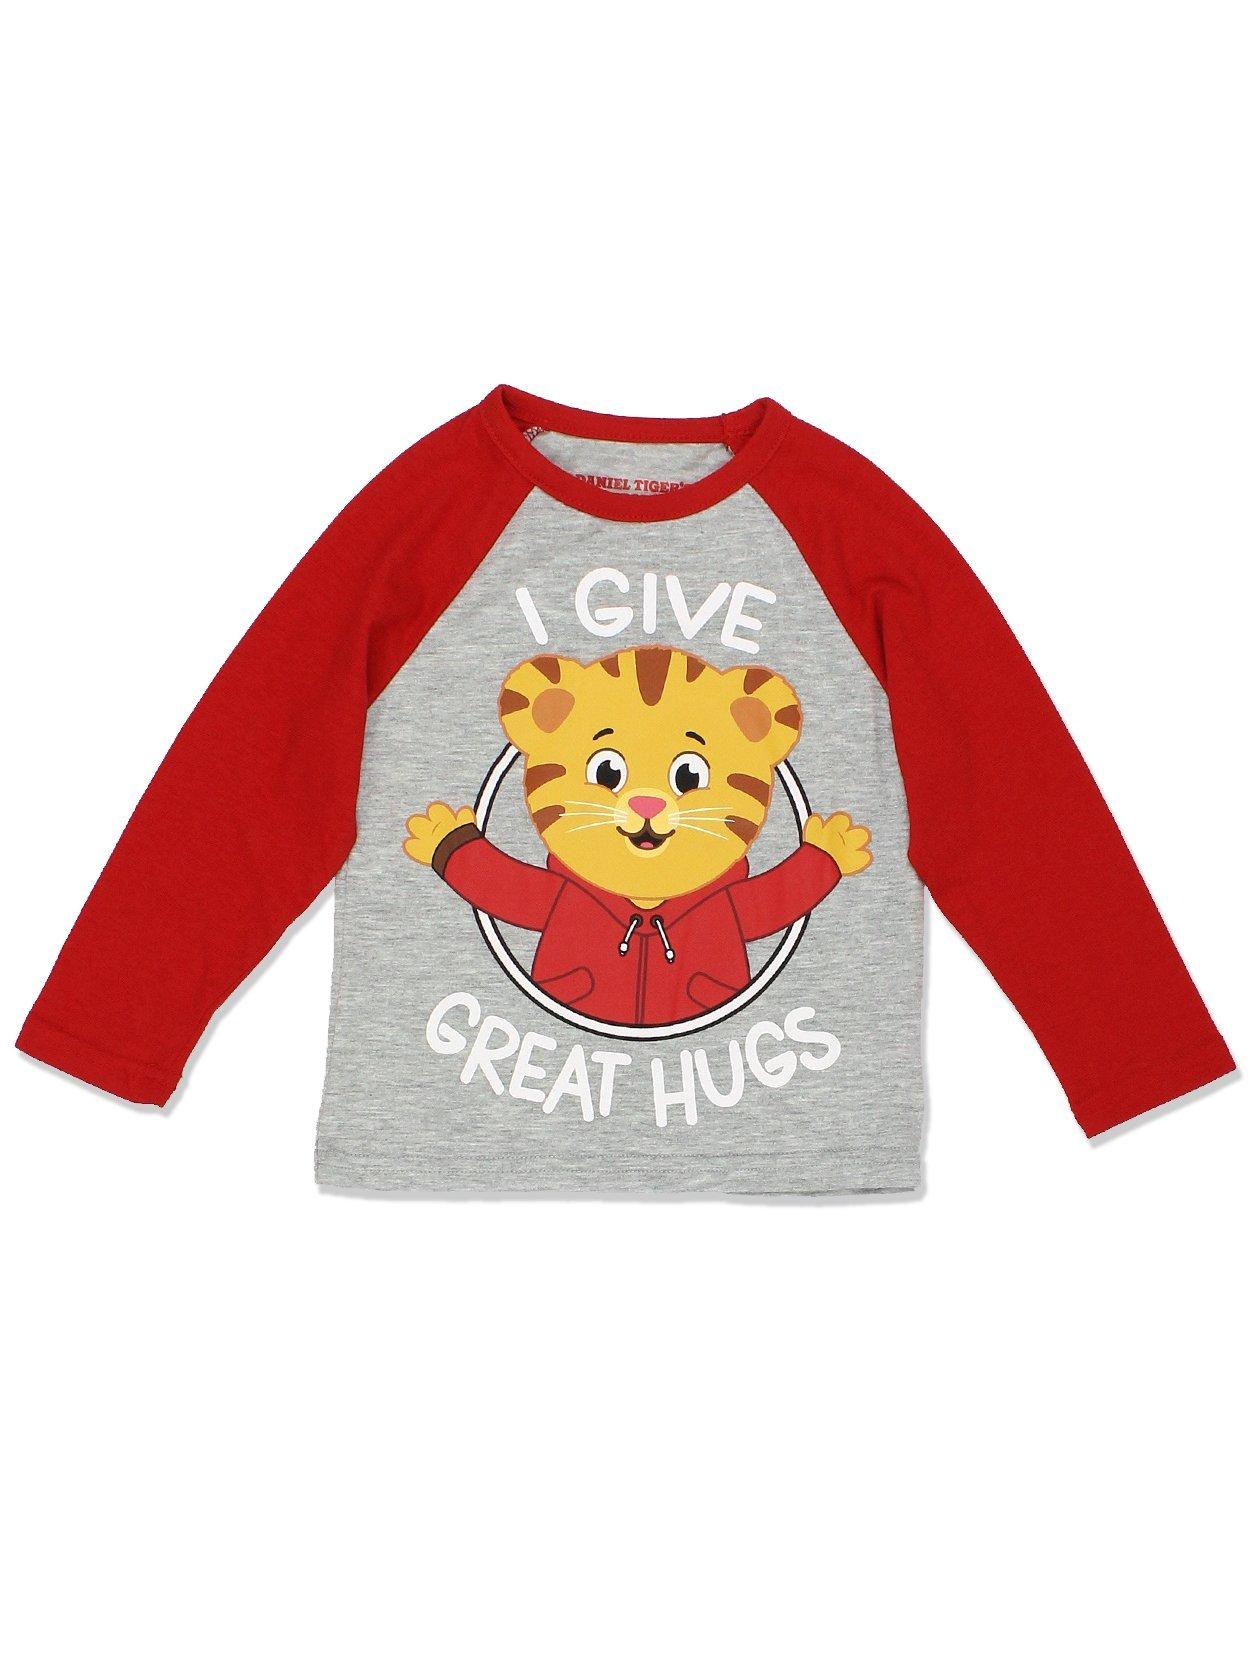 Daniel Tiger Toddler Boys Girls Long Sleeve Tee (2T, Red/Grey)